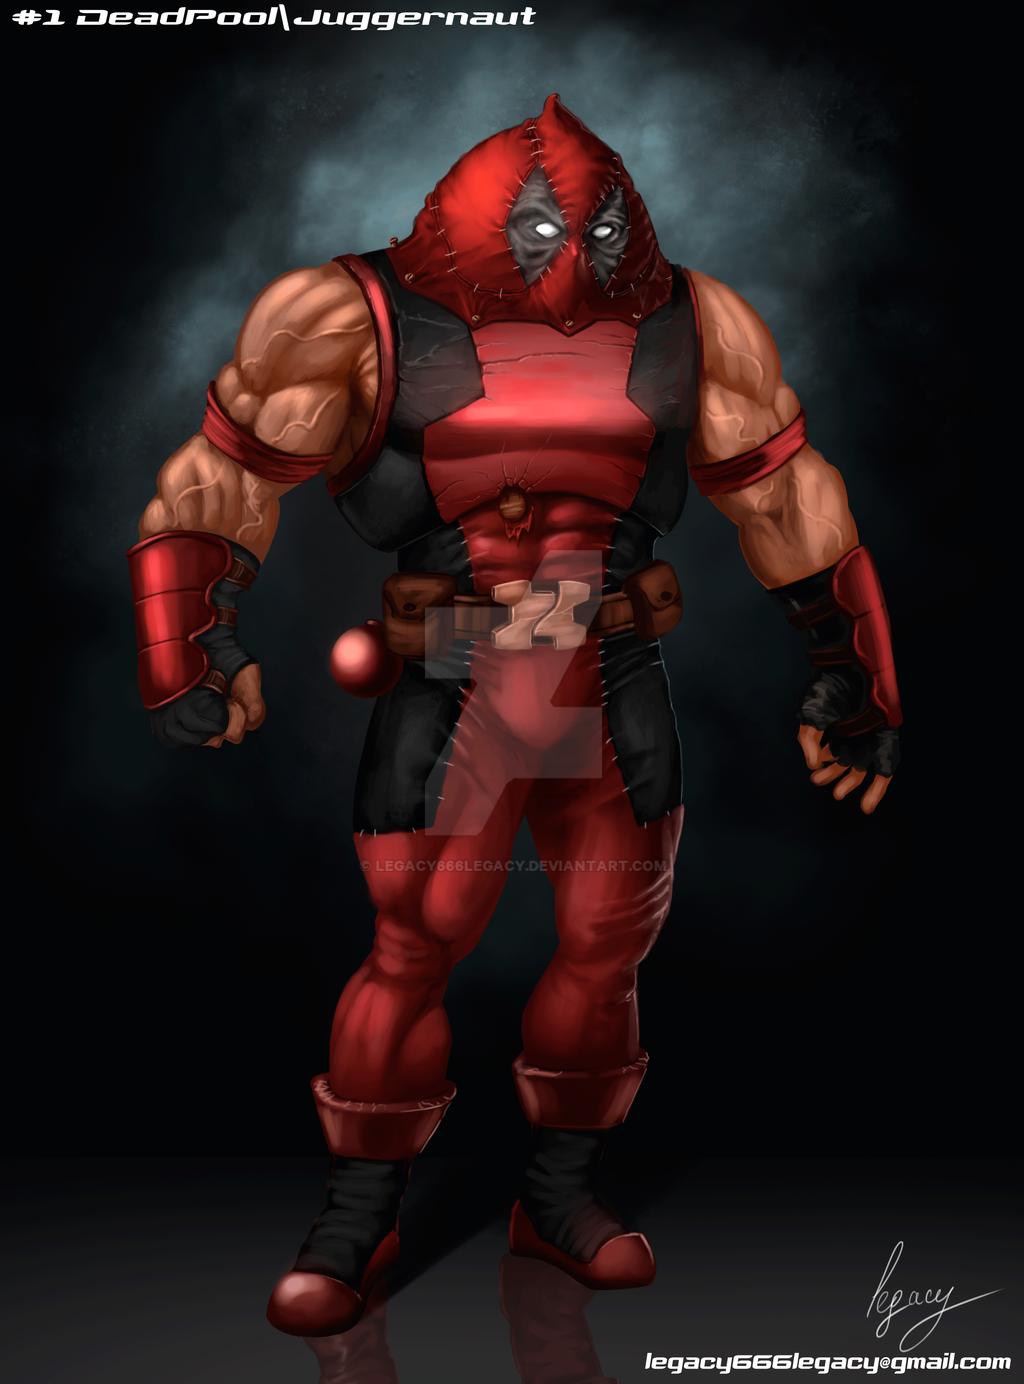 Best Wallpaper Marvel Juggernaut - deadpool_juggernaut_by_legacy666legacy-d98yxrj  Picture_964386.png